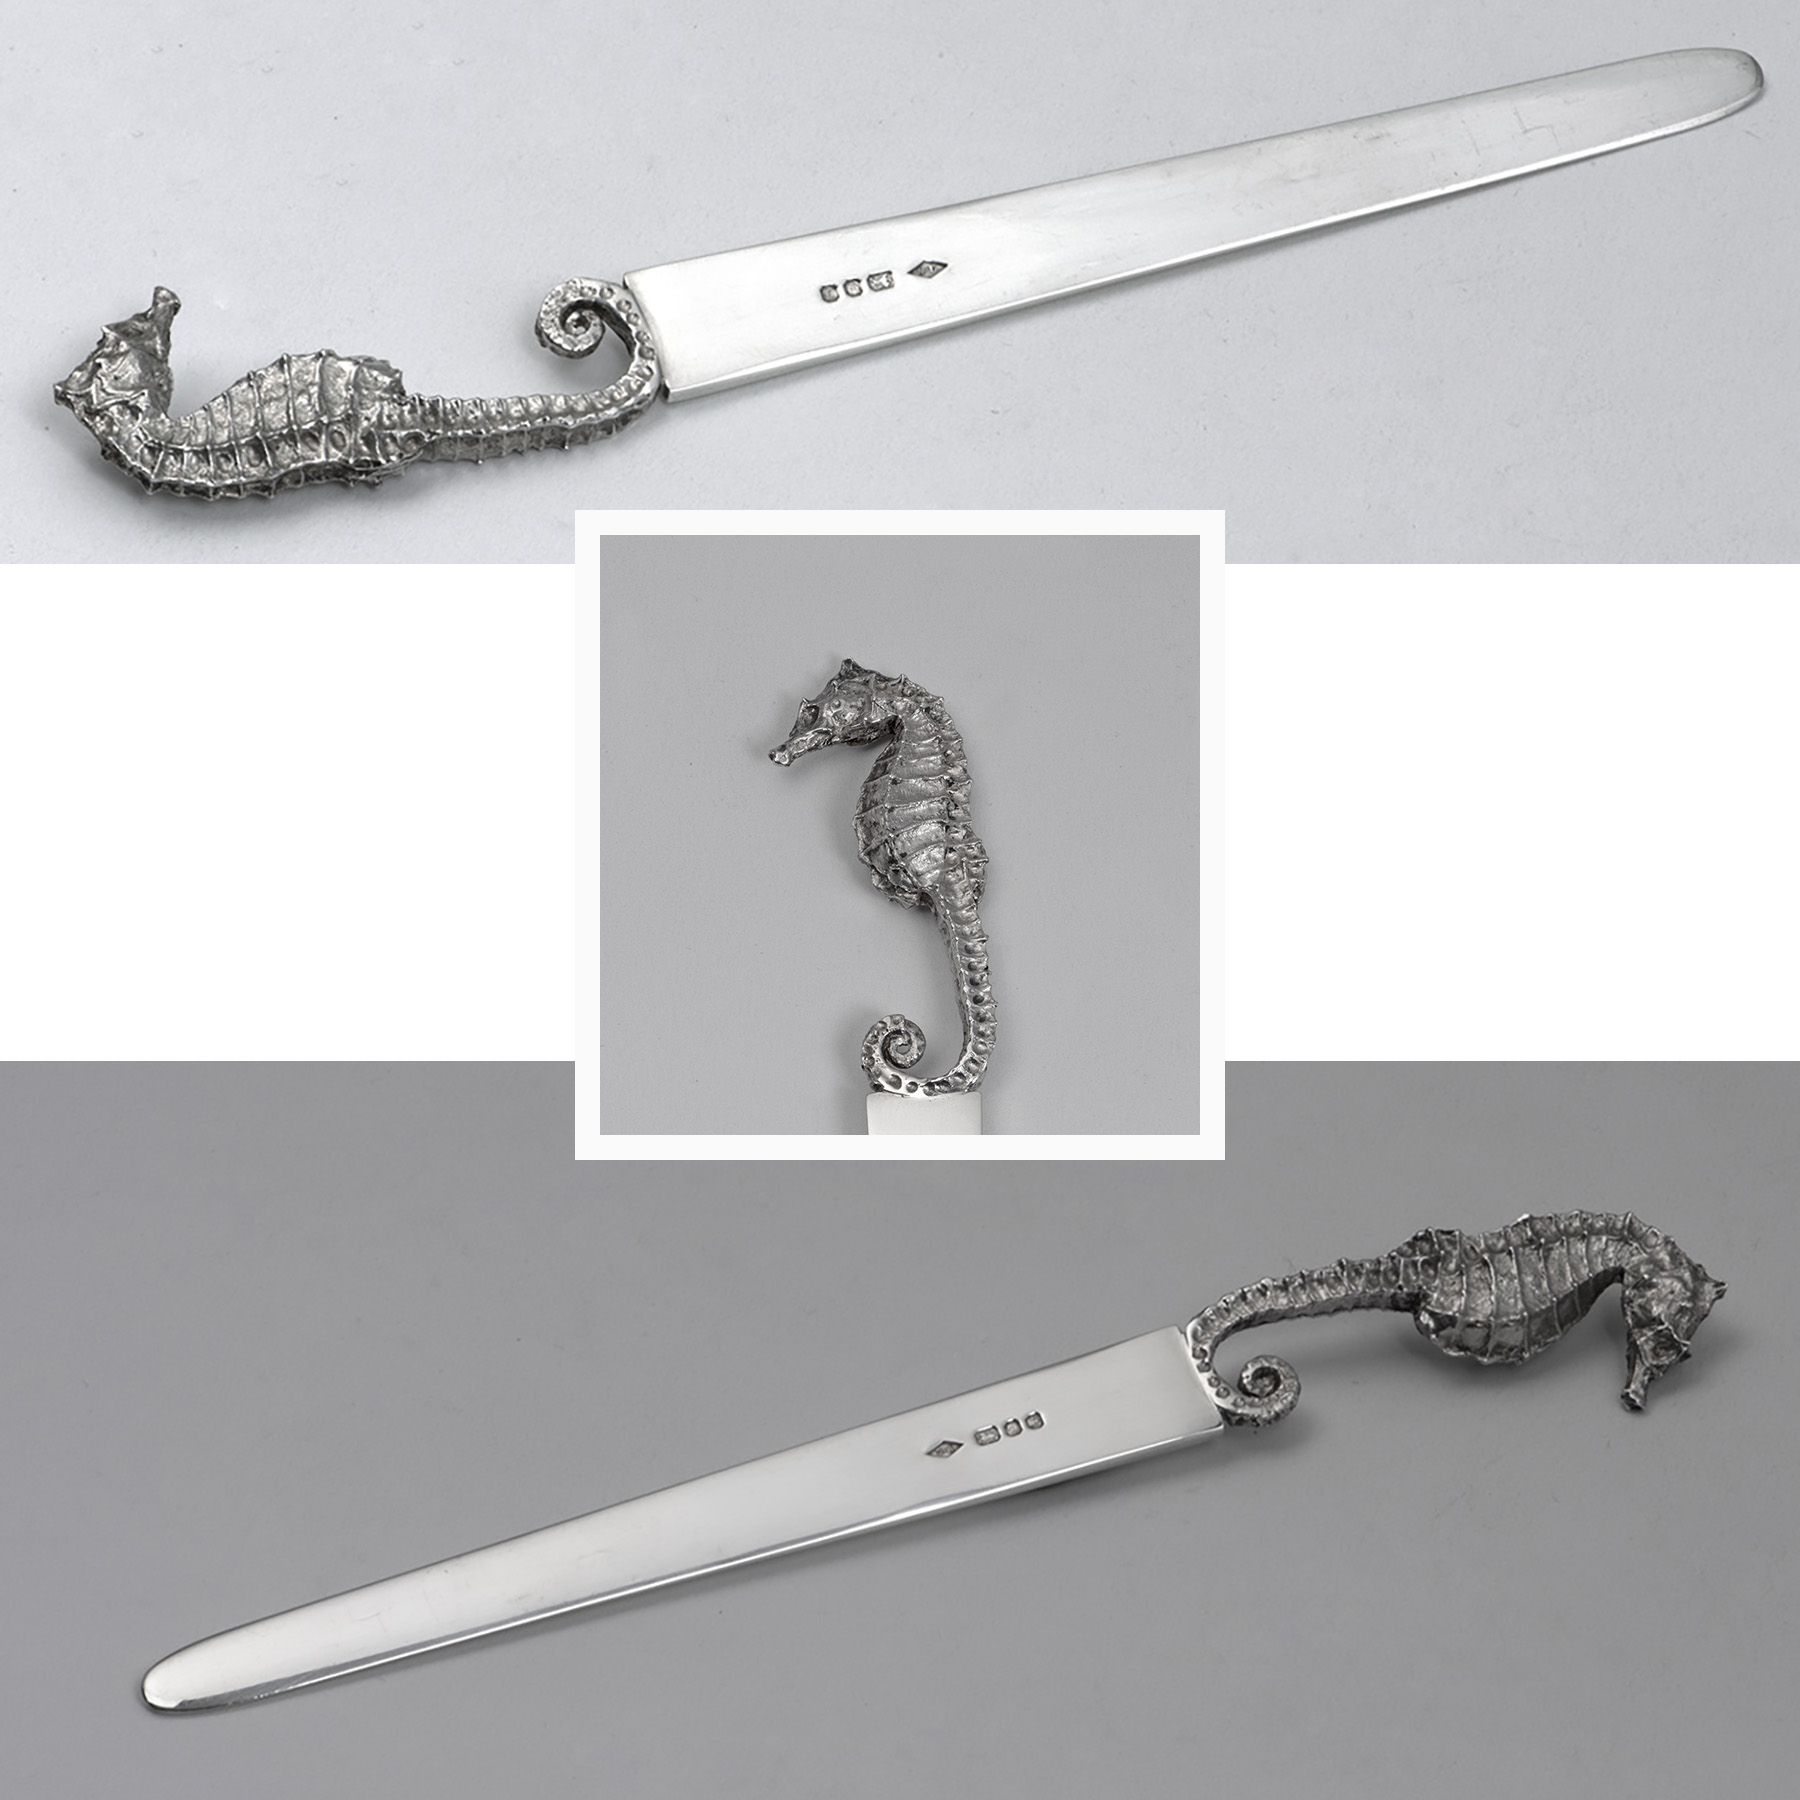 A Graham Watling Paper Knife.